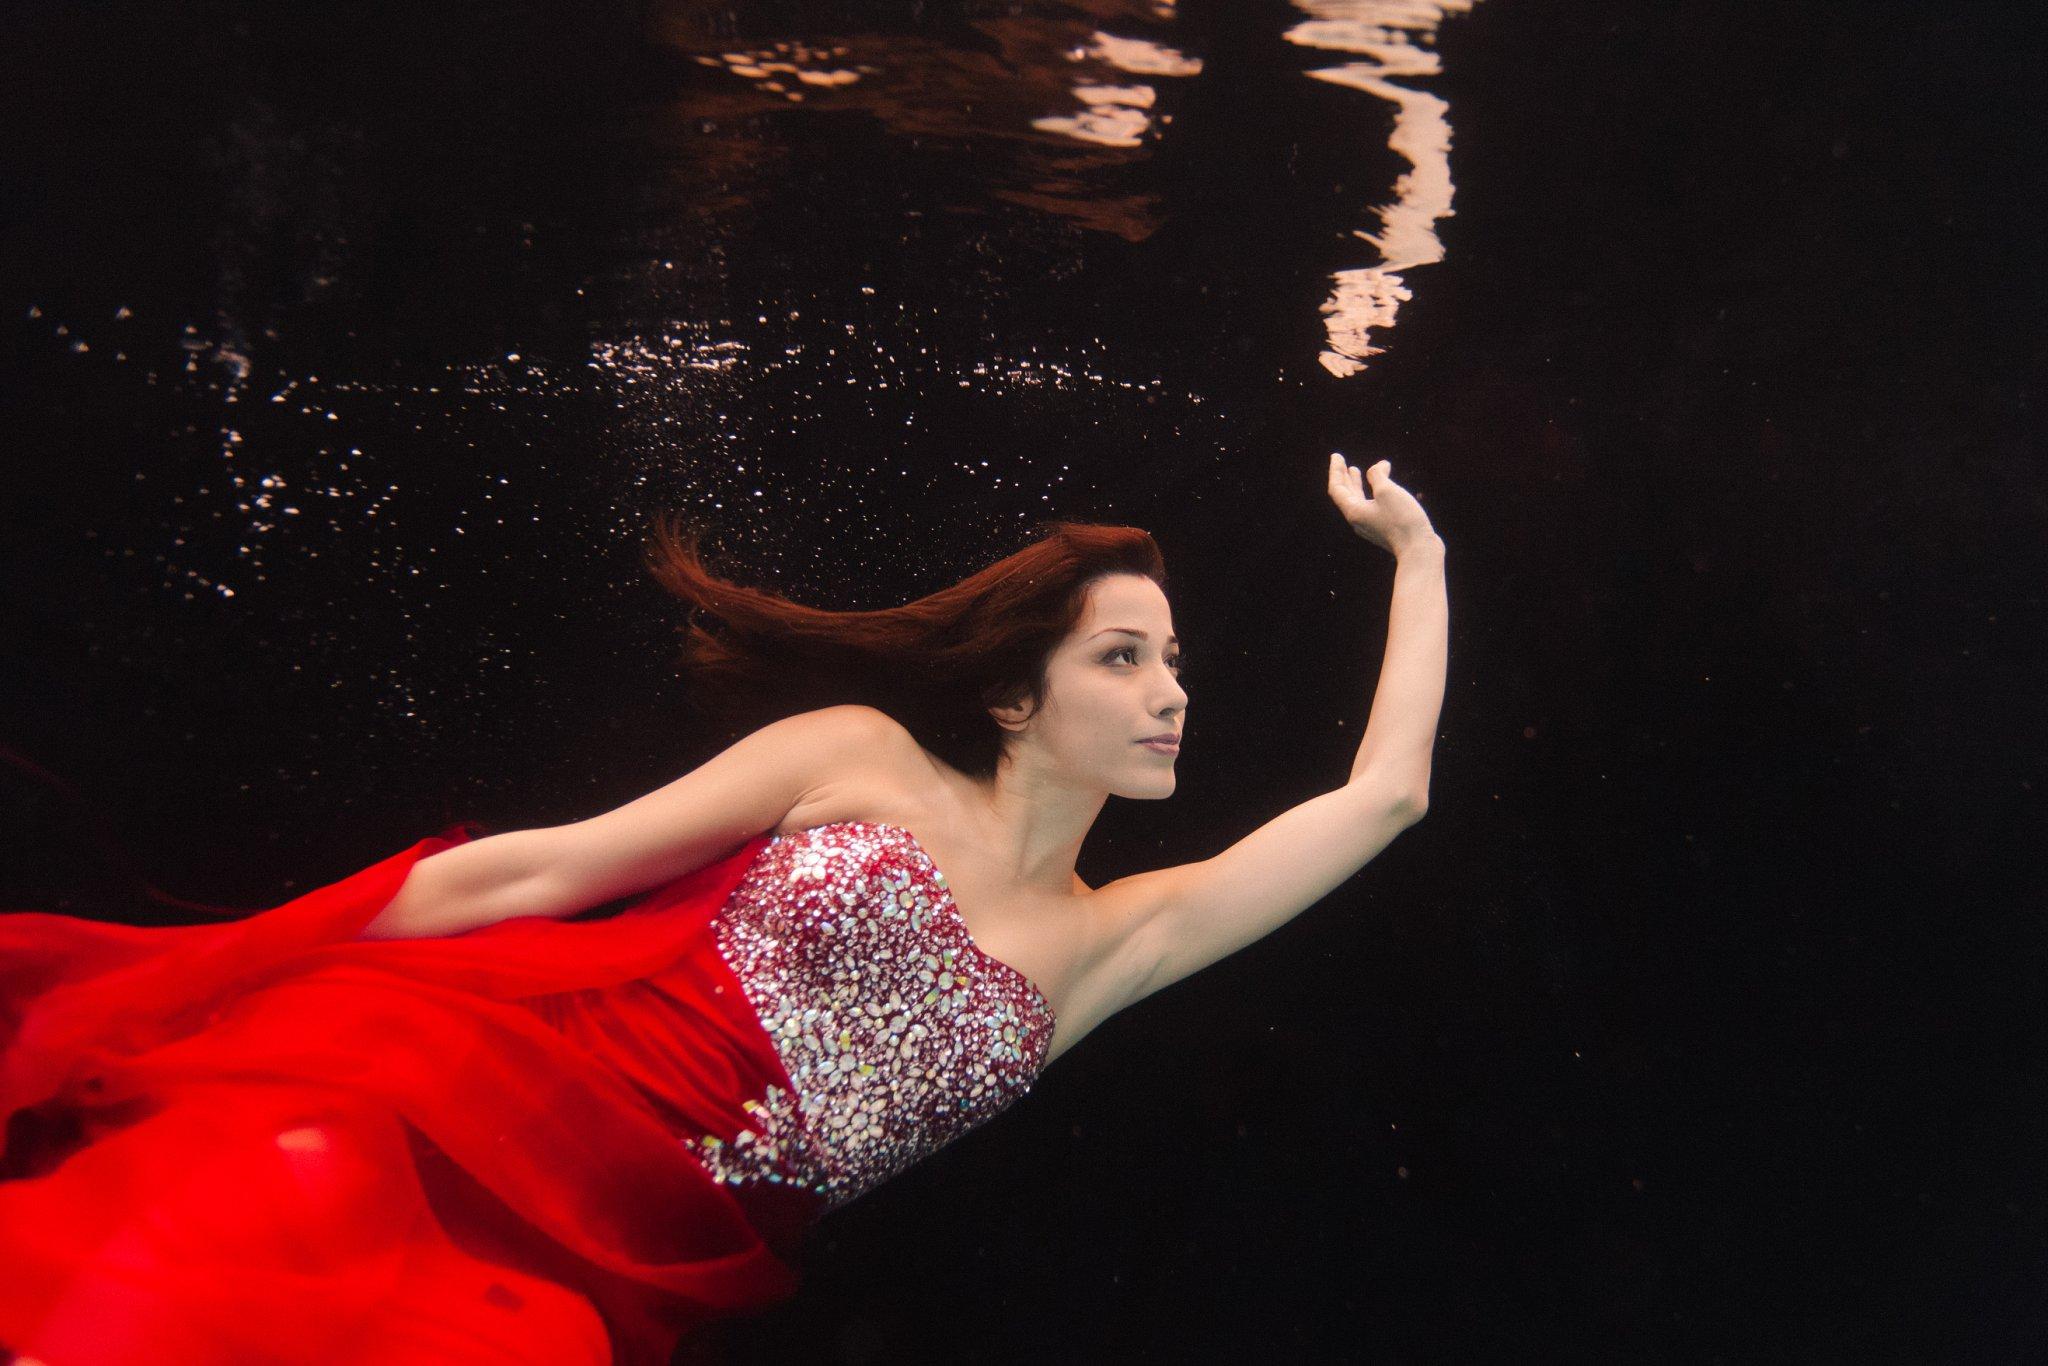 Arizona underwater fashion portraits in red dress